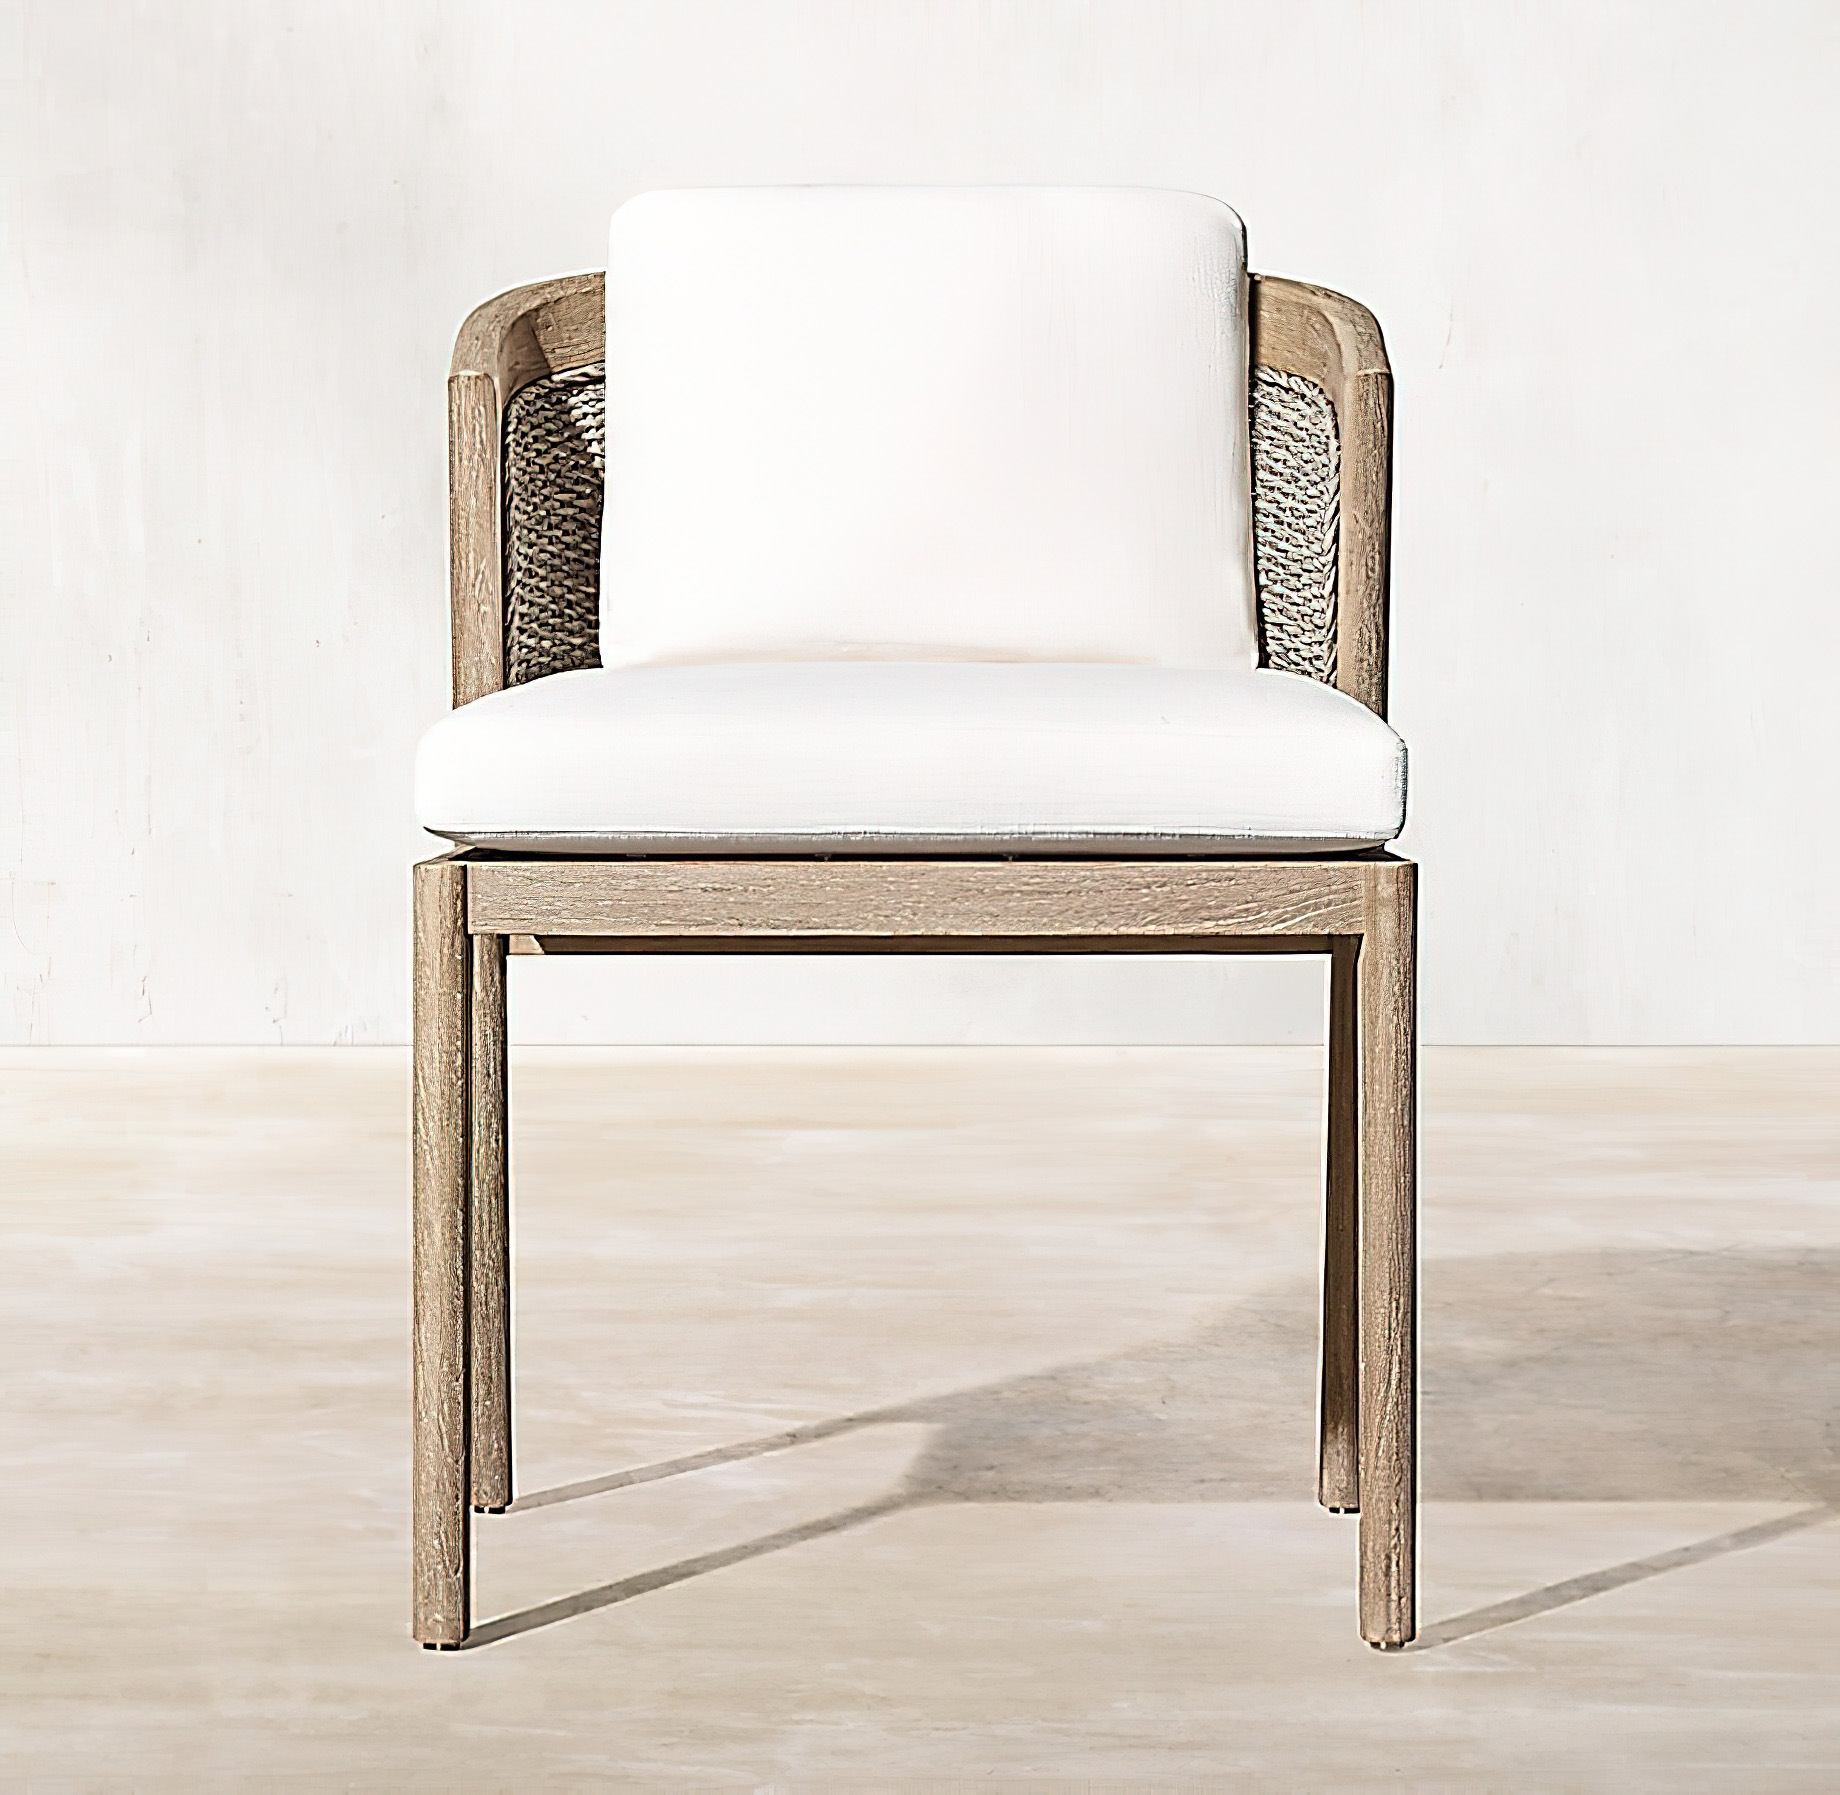 Malta Teak Collection Outdoor Furniture Design for RH – Ramon Esteve – Malta Teak Side Chair